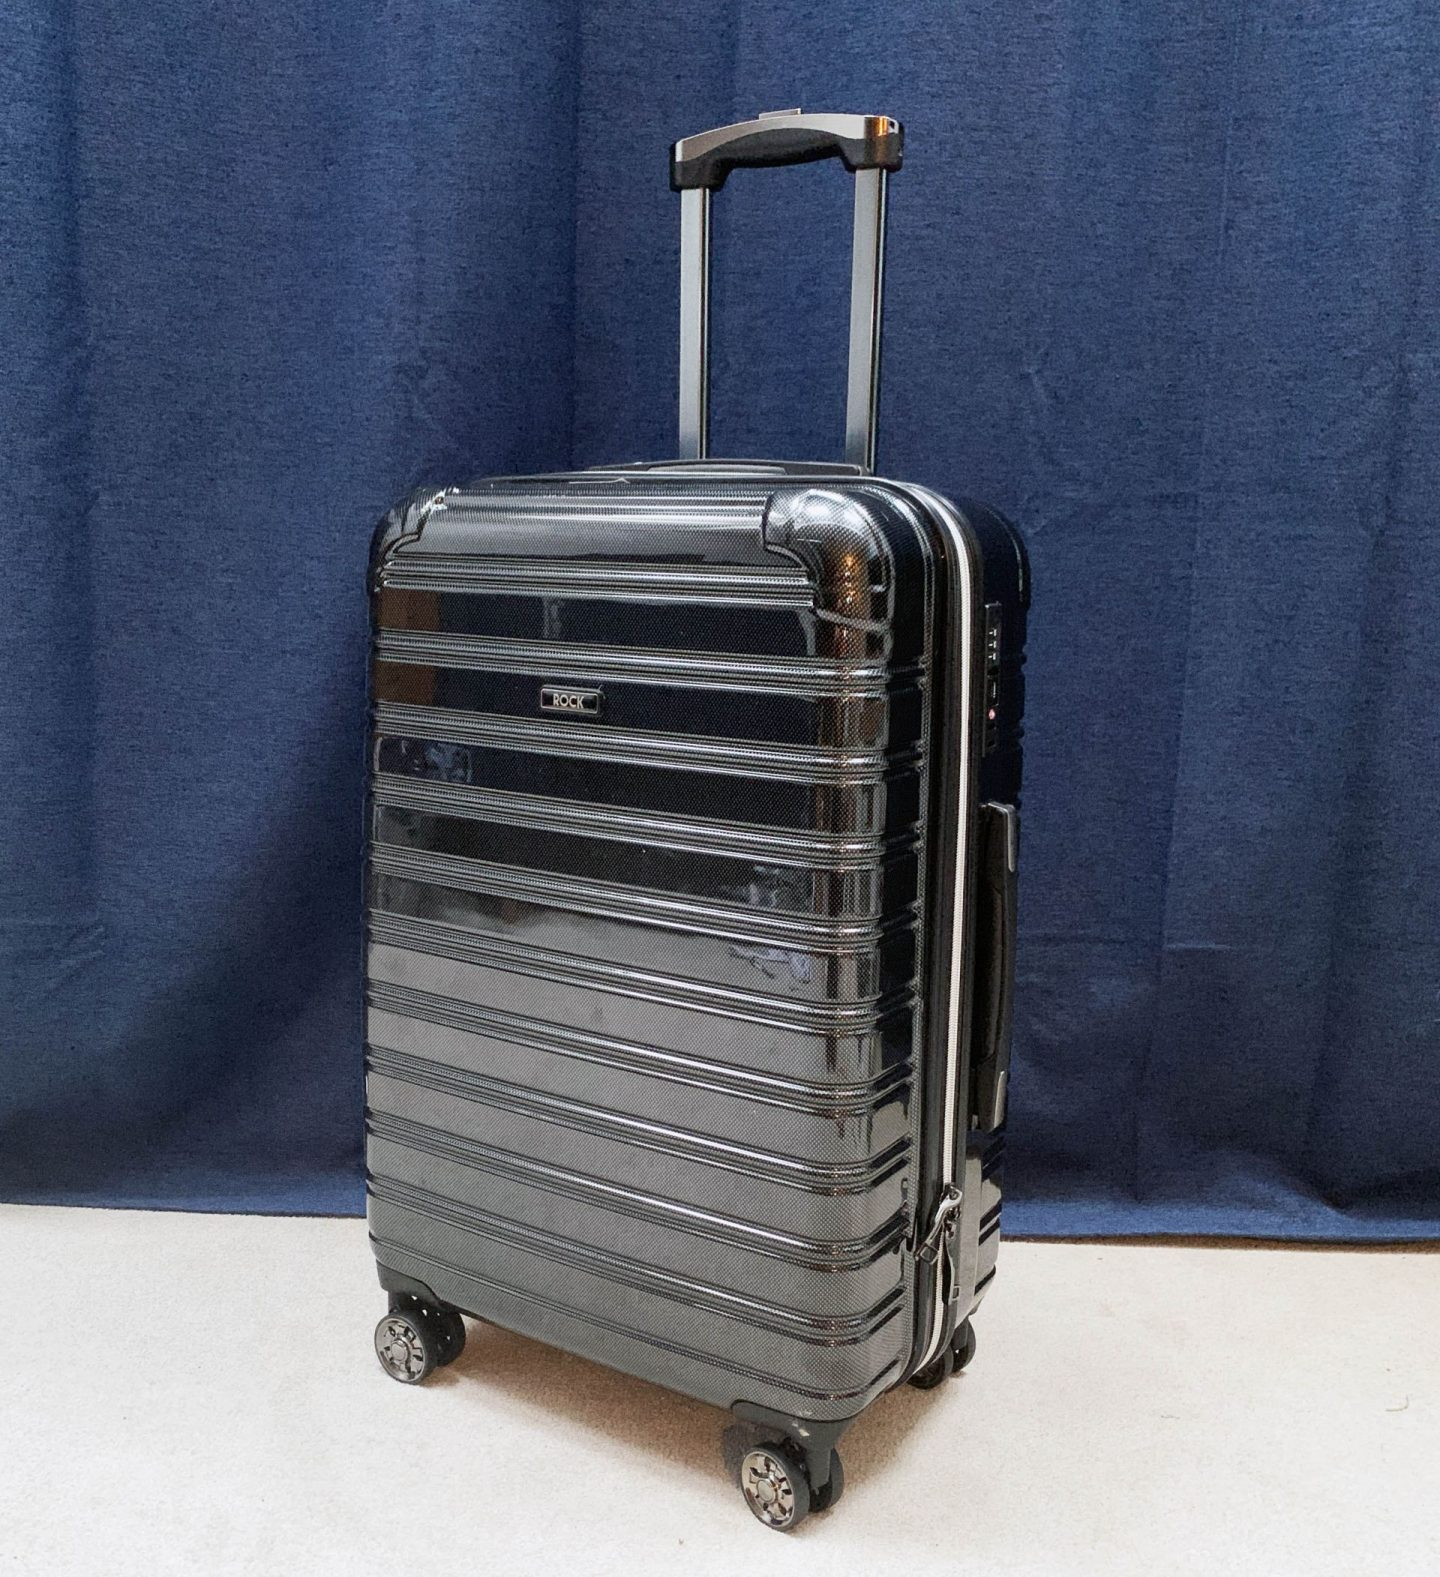 Hard shell suitcase.